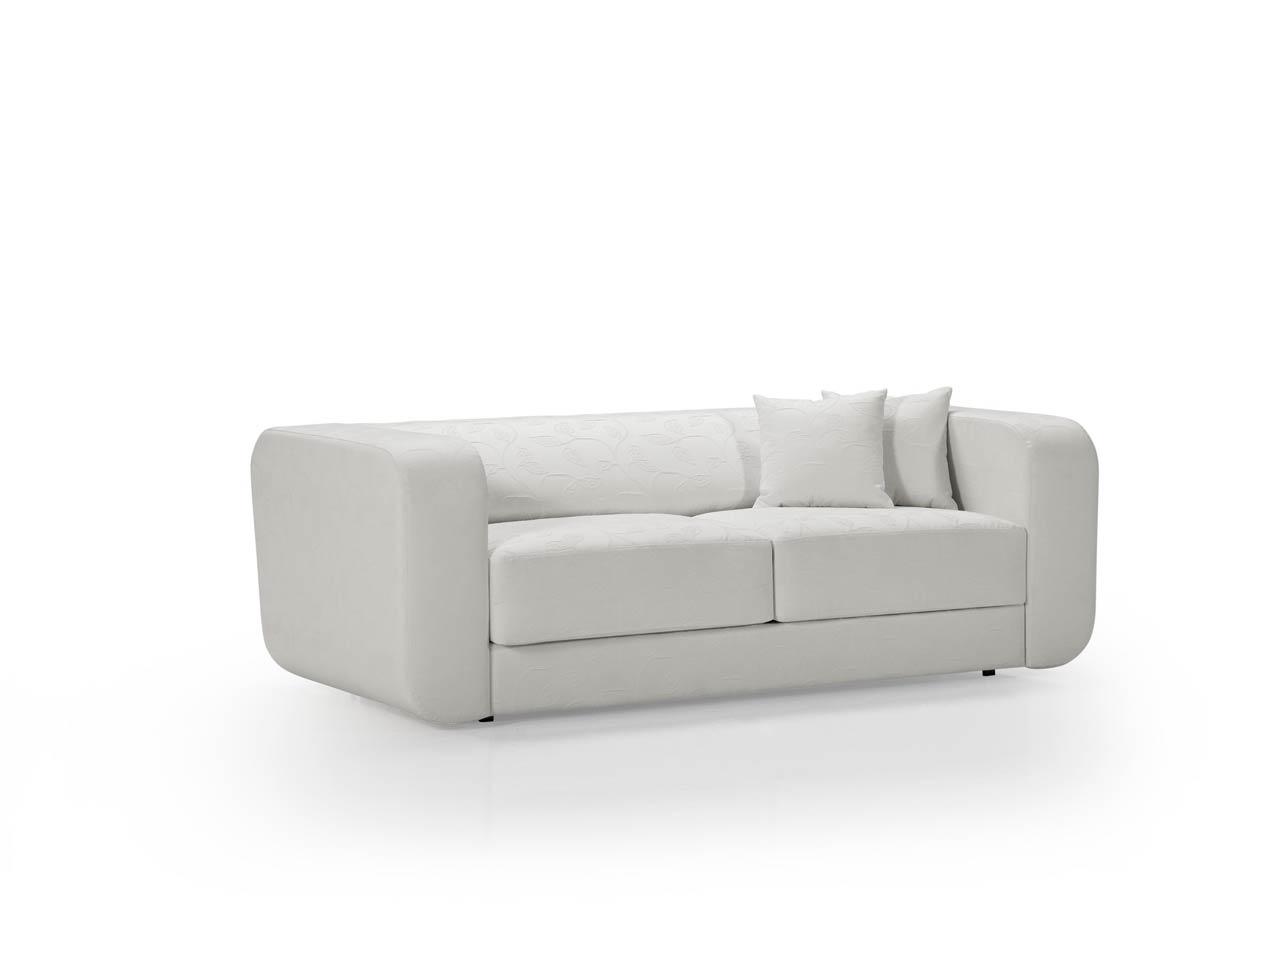 Comprar sofa cama barato online for Sofa cama puff barato